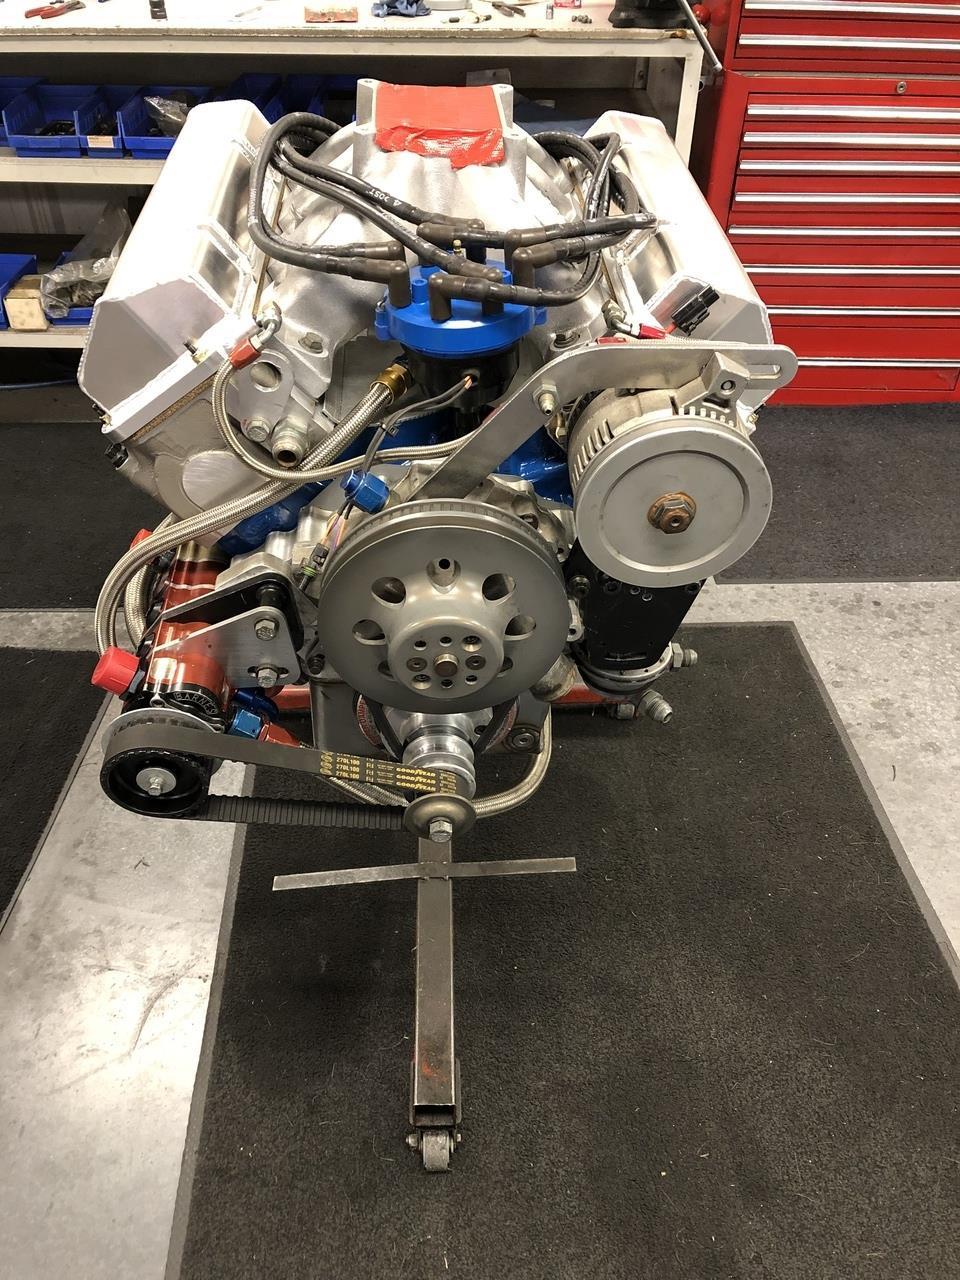 Fresh Built 357cid Ford Yates C3 Engine 790HP 541ft-lbs Torque